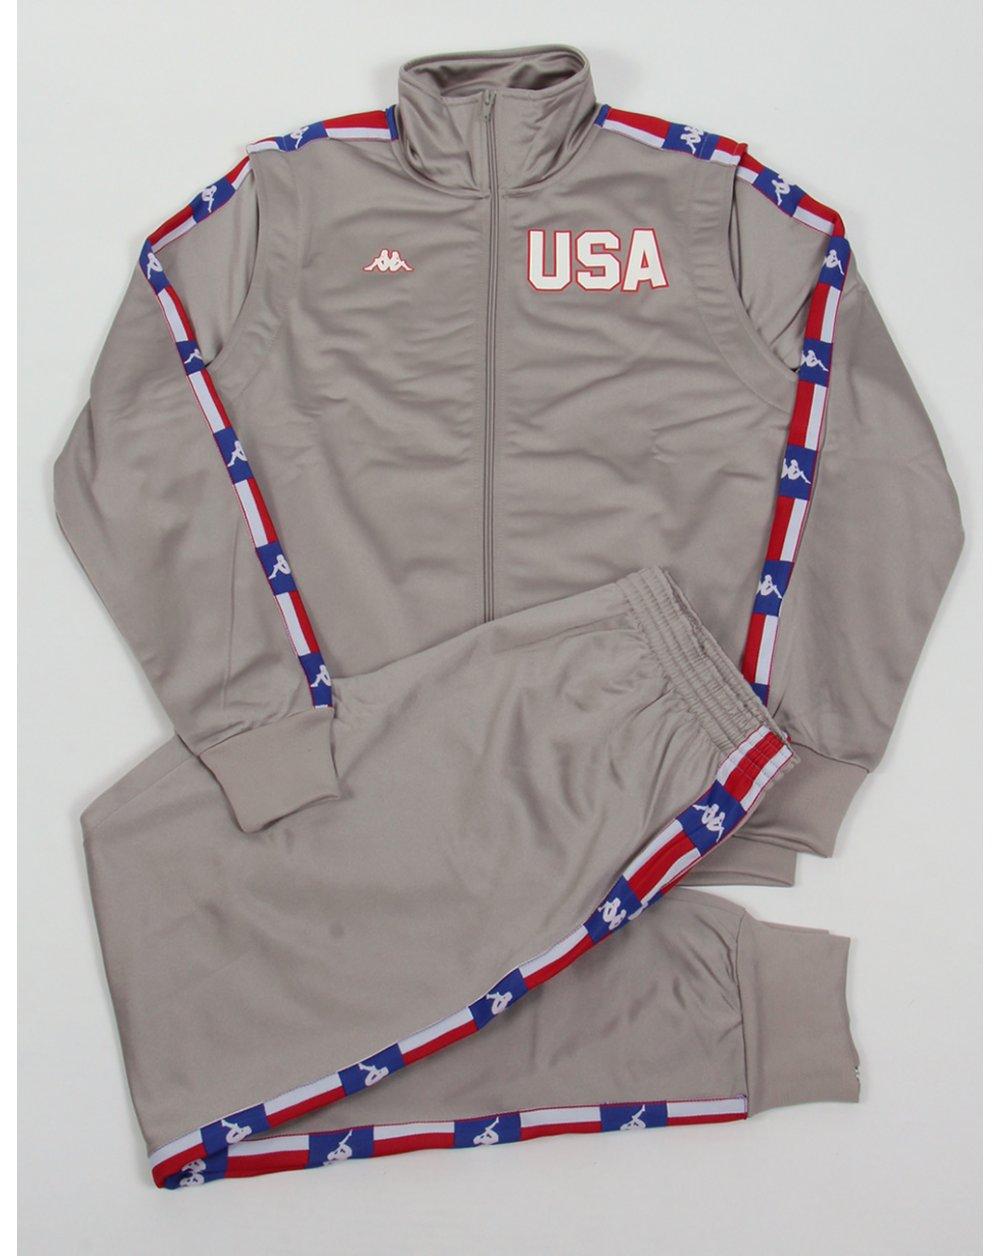 0dda7203 Robe Di Kappa La84 Usa Olympic Full Tracksuit Silver Grey